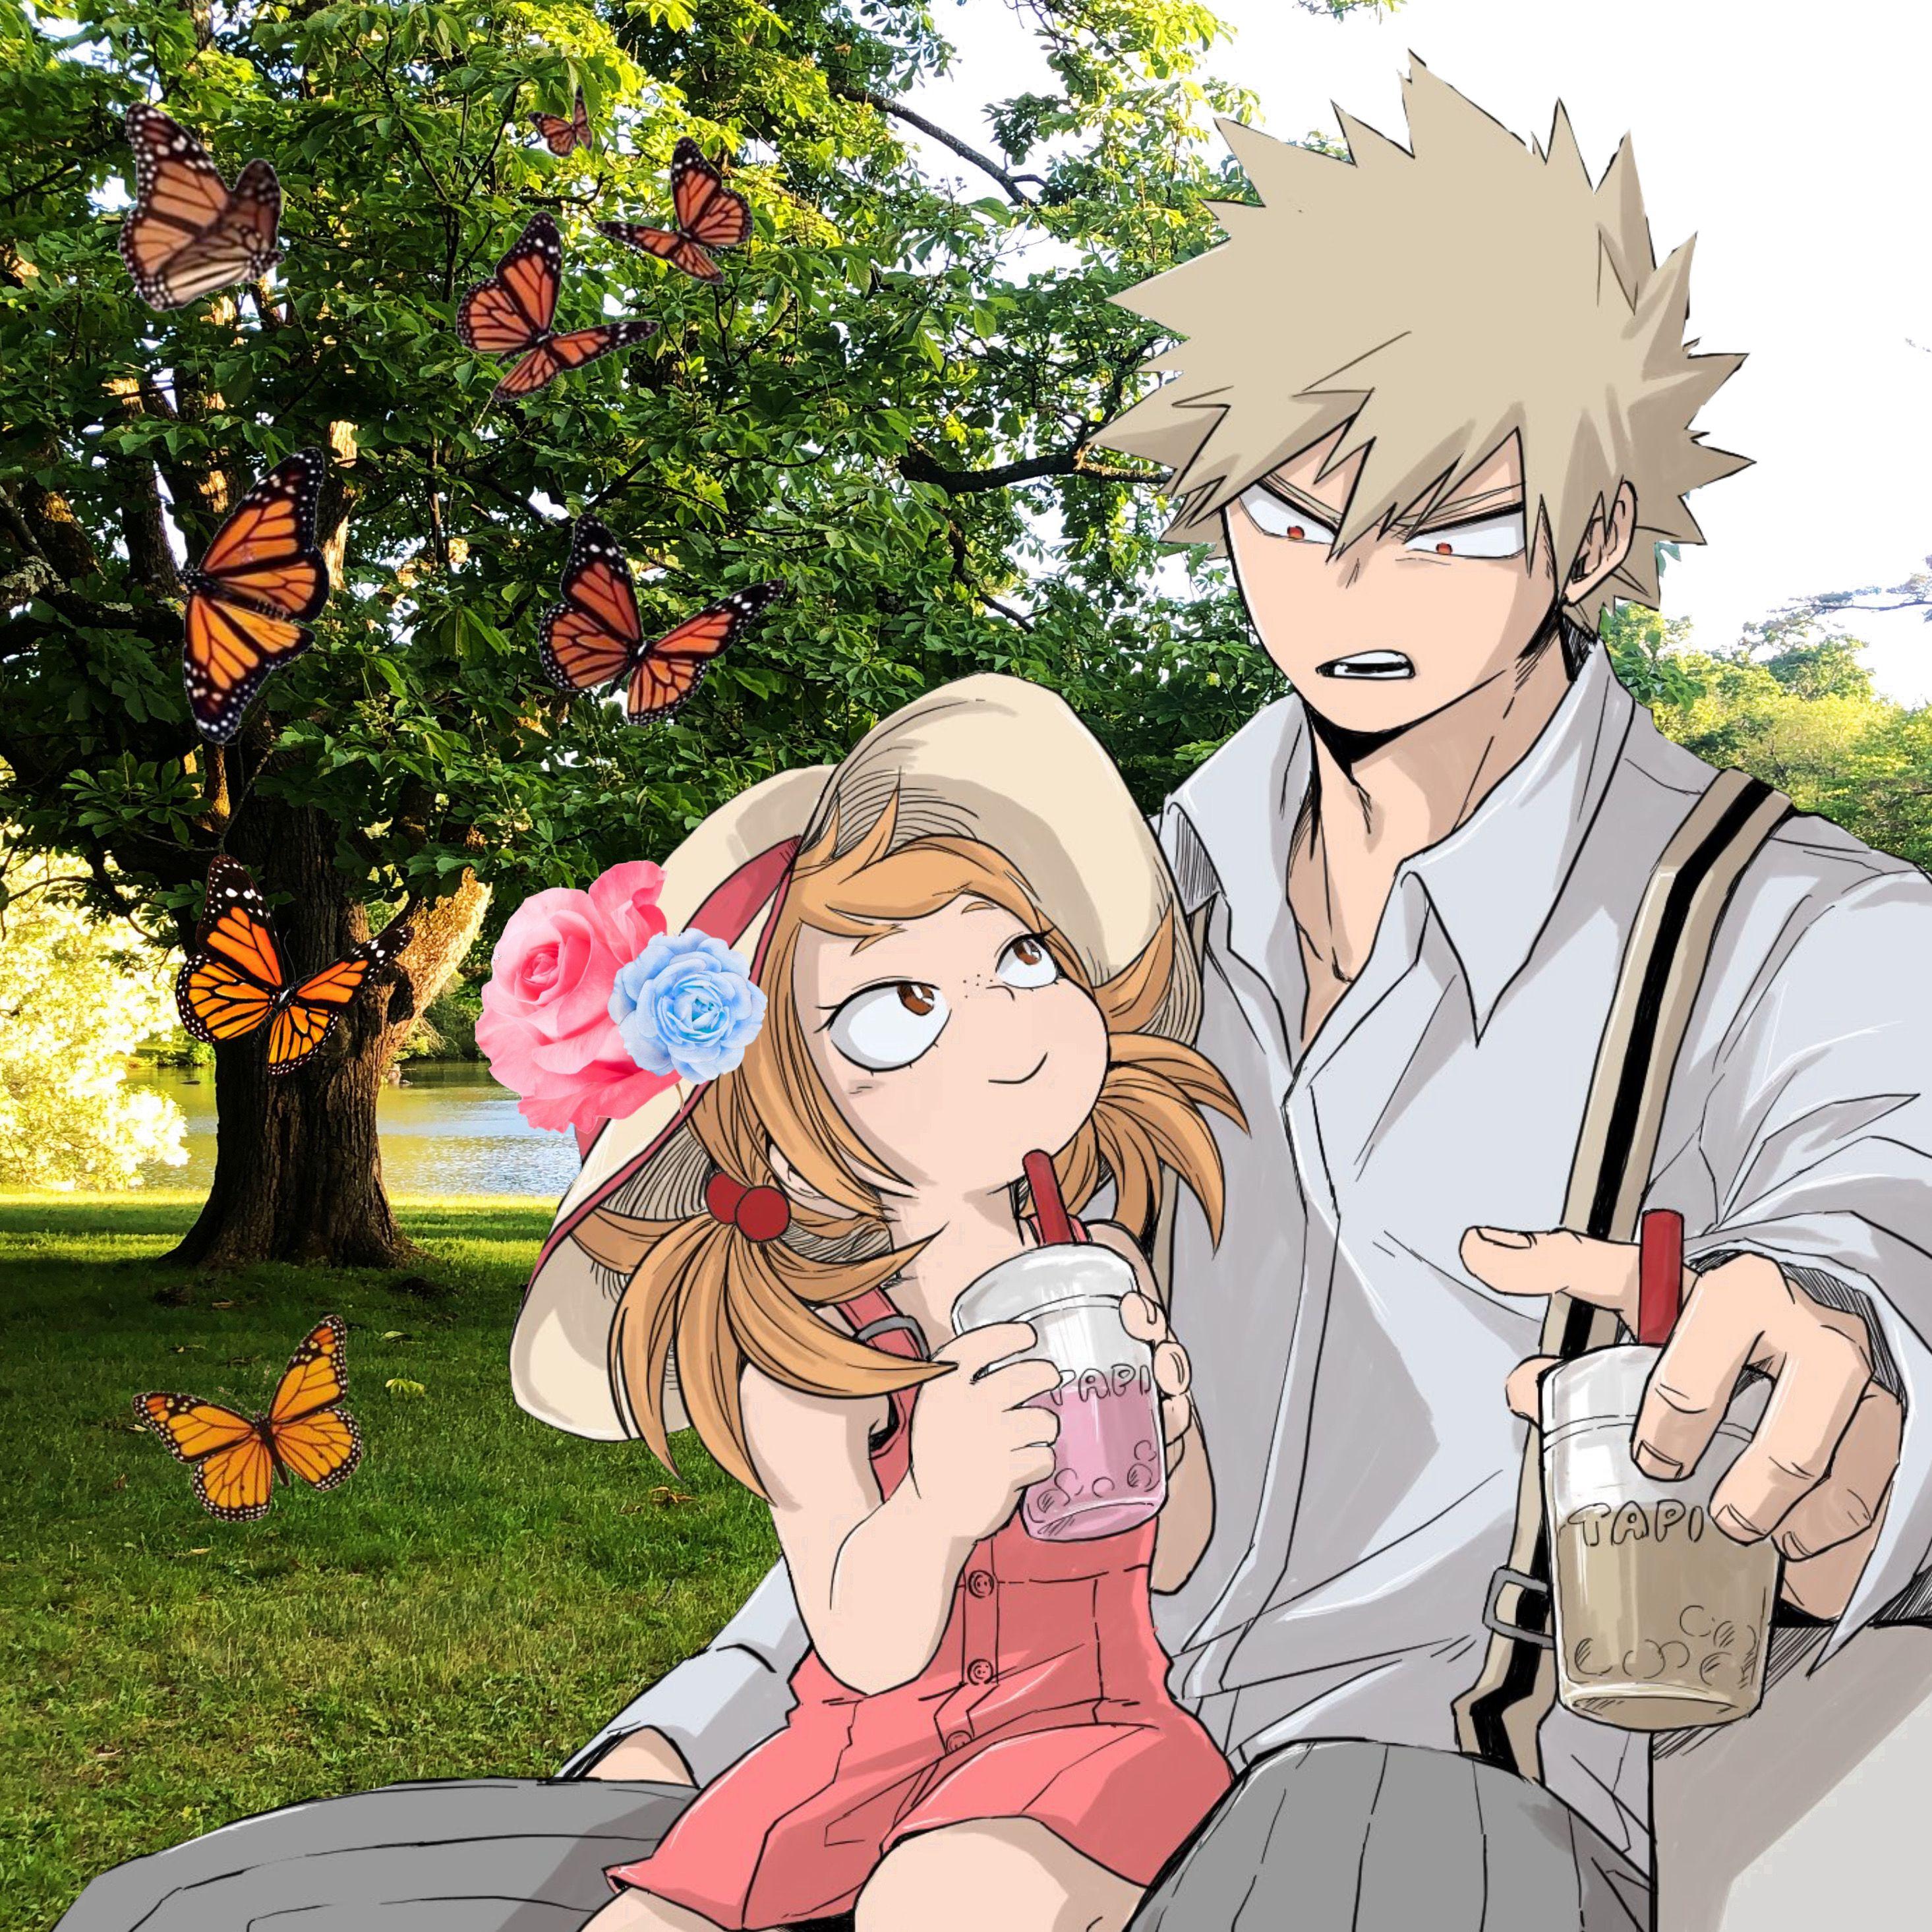 Pin by 𝖅𝖆𝖎𝖓𝖆 on BnHA Anime, Artist, Hero